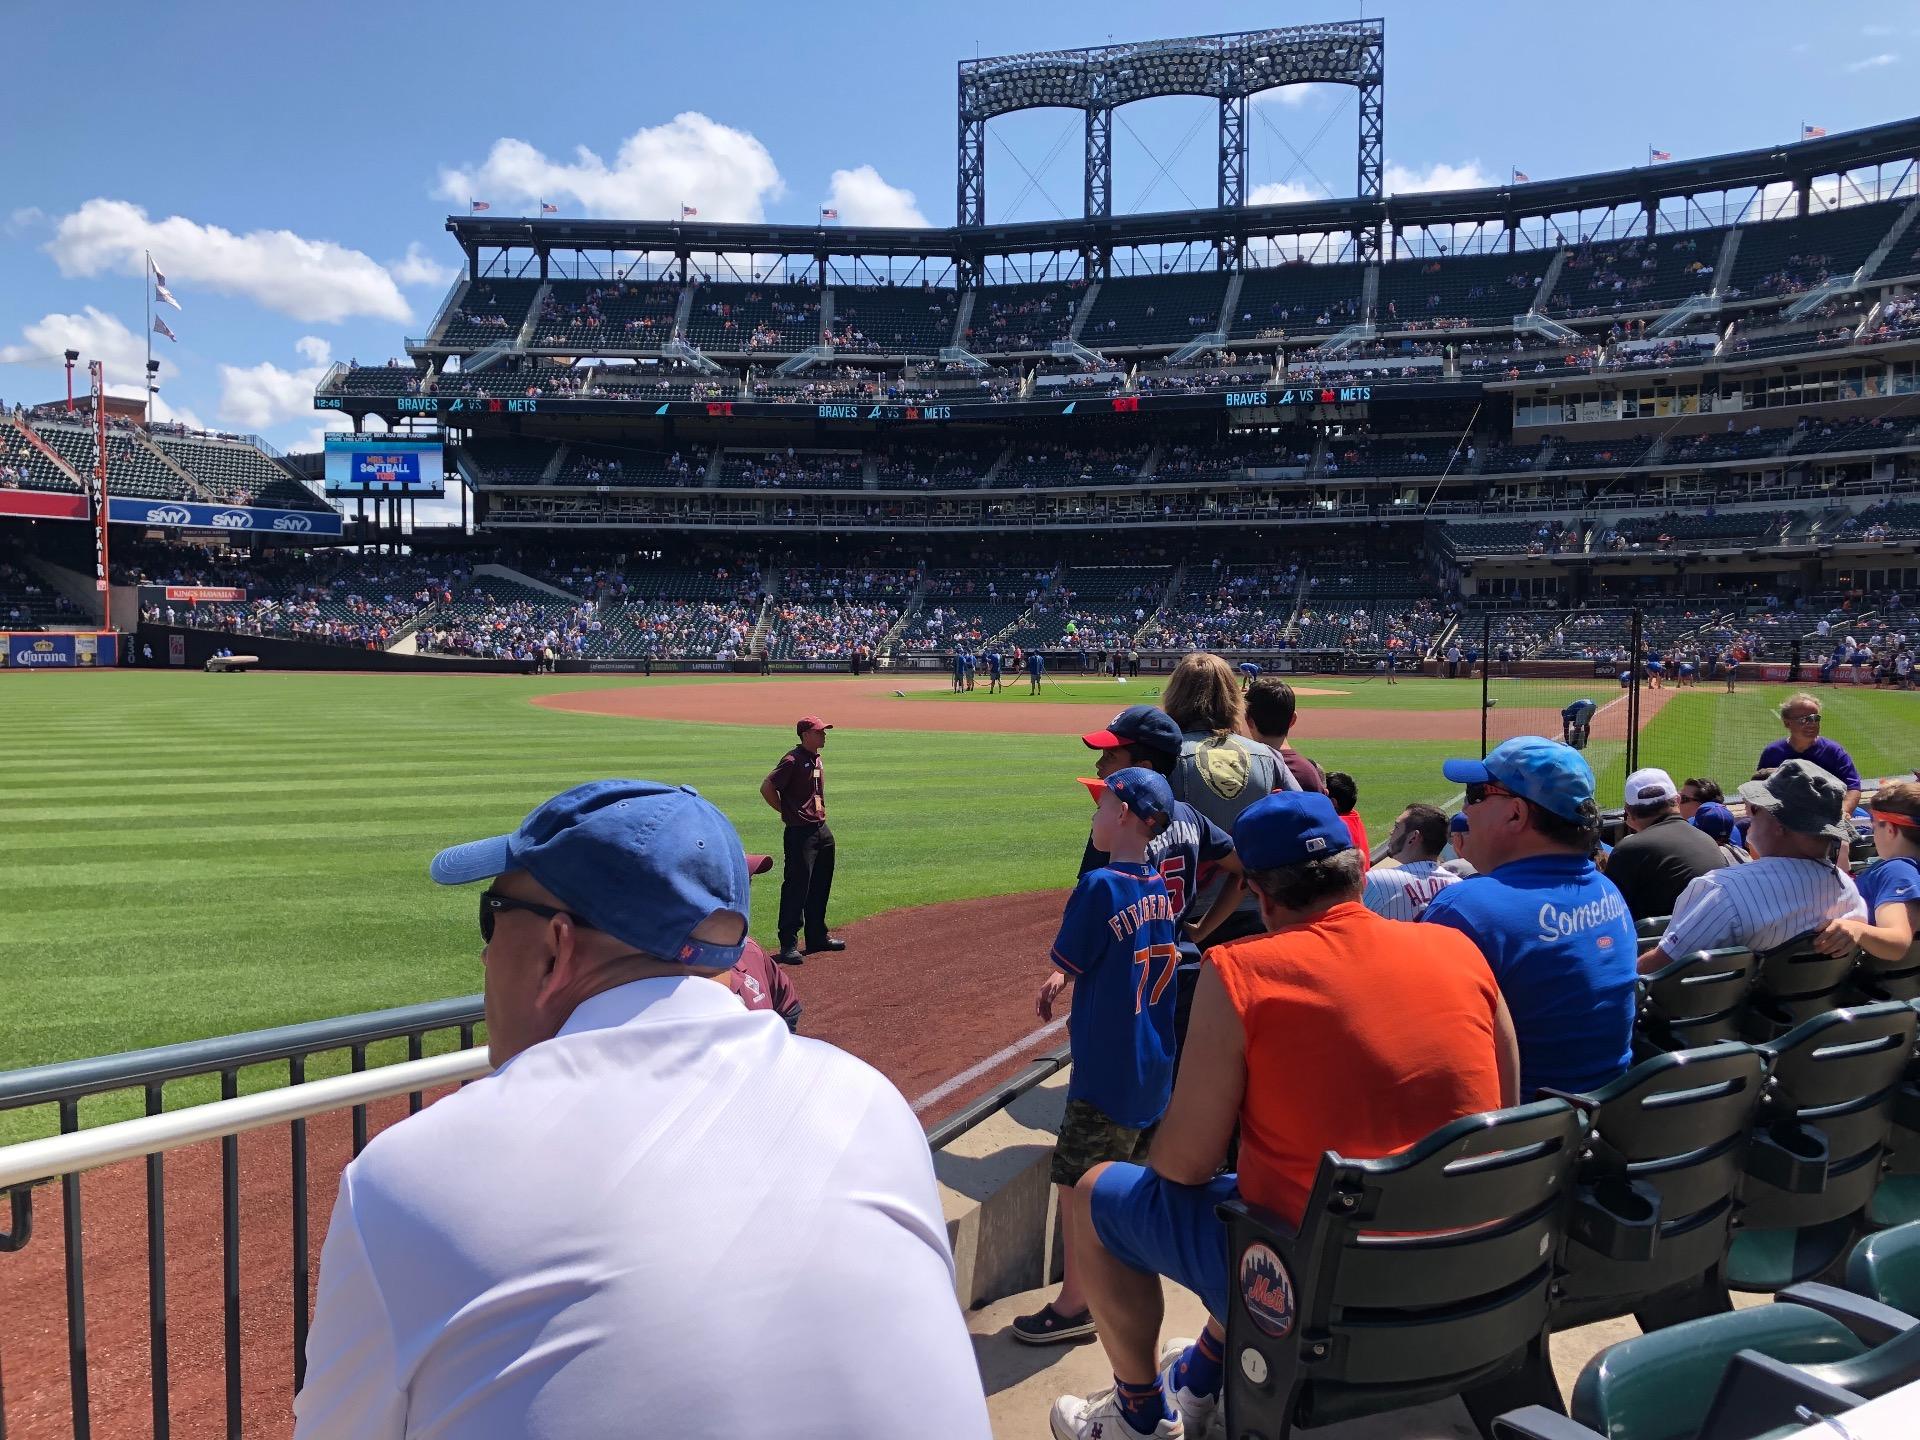 Citi Field Section 128 Row 3 Seat 17